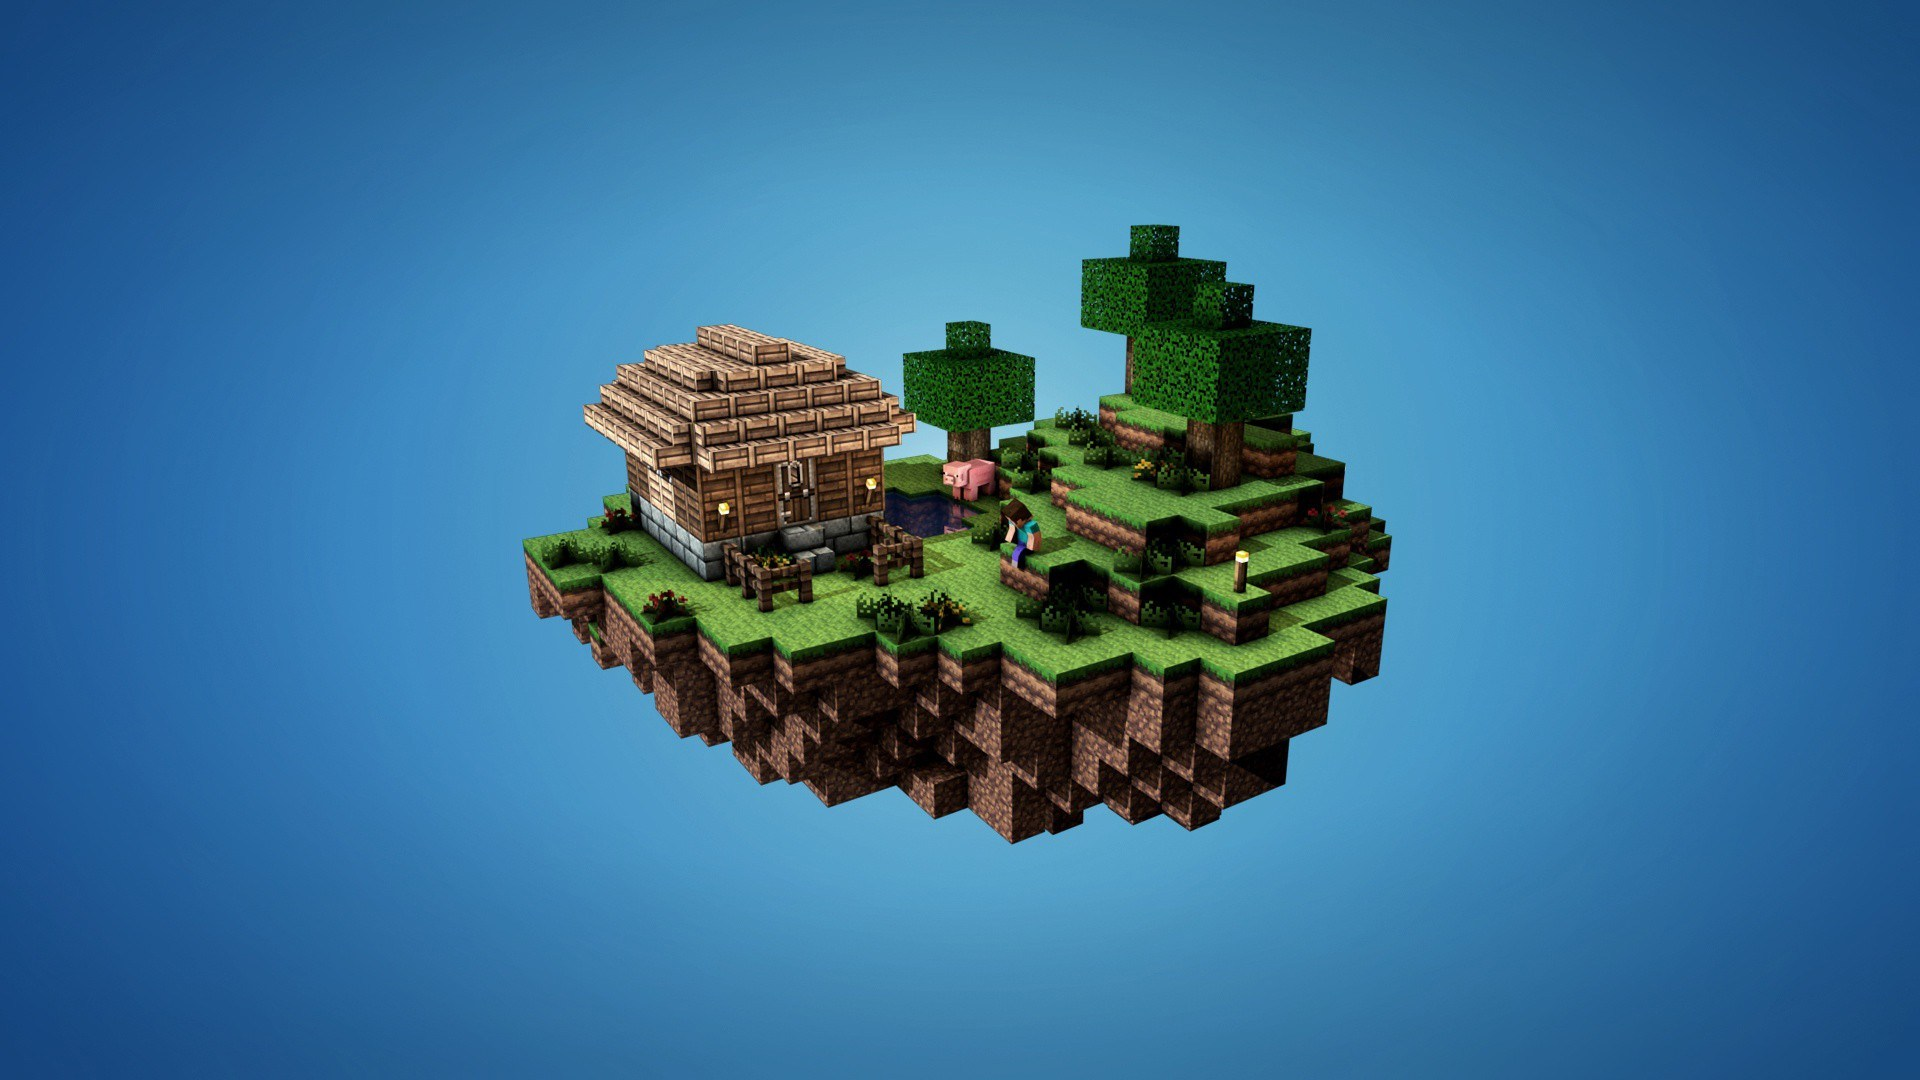 Top 10 Minecraft Wallpapers 3 10 Minecraft Sky Island House 1920x1080 Download Hd Wallpaper Wallpapertip